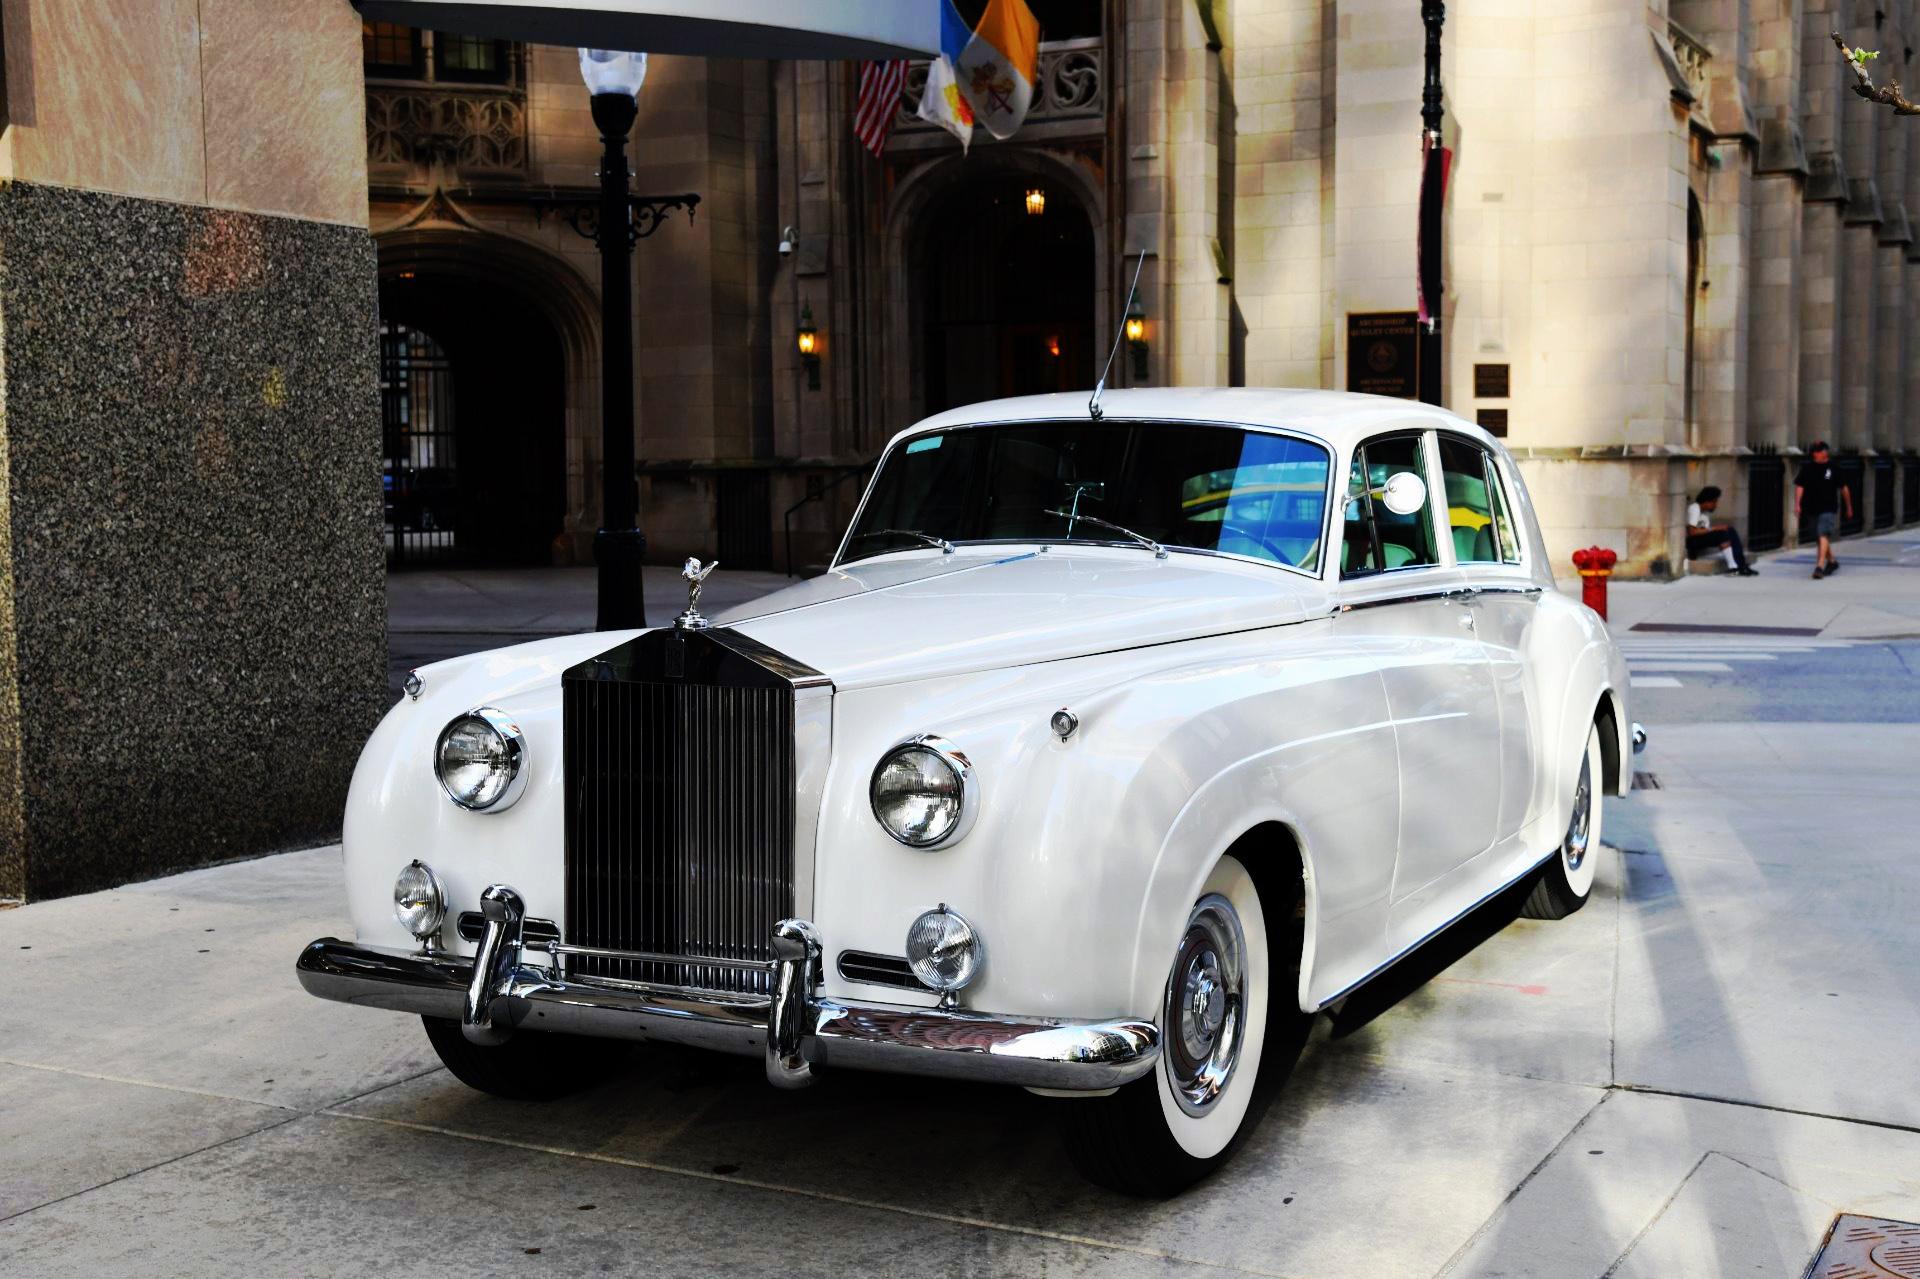 Rolls Royce Vintage Car Chicago